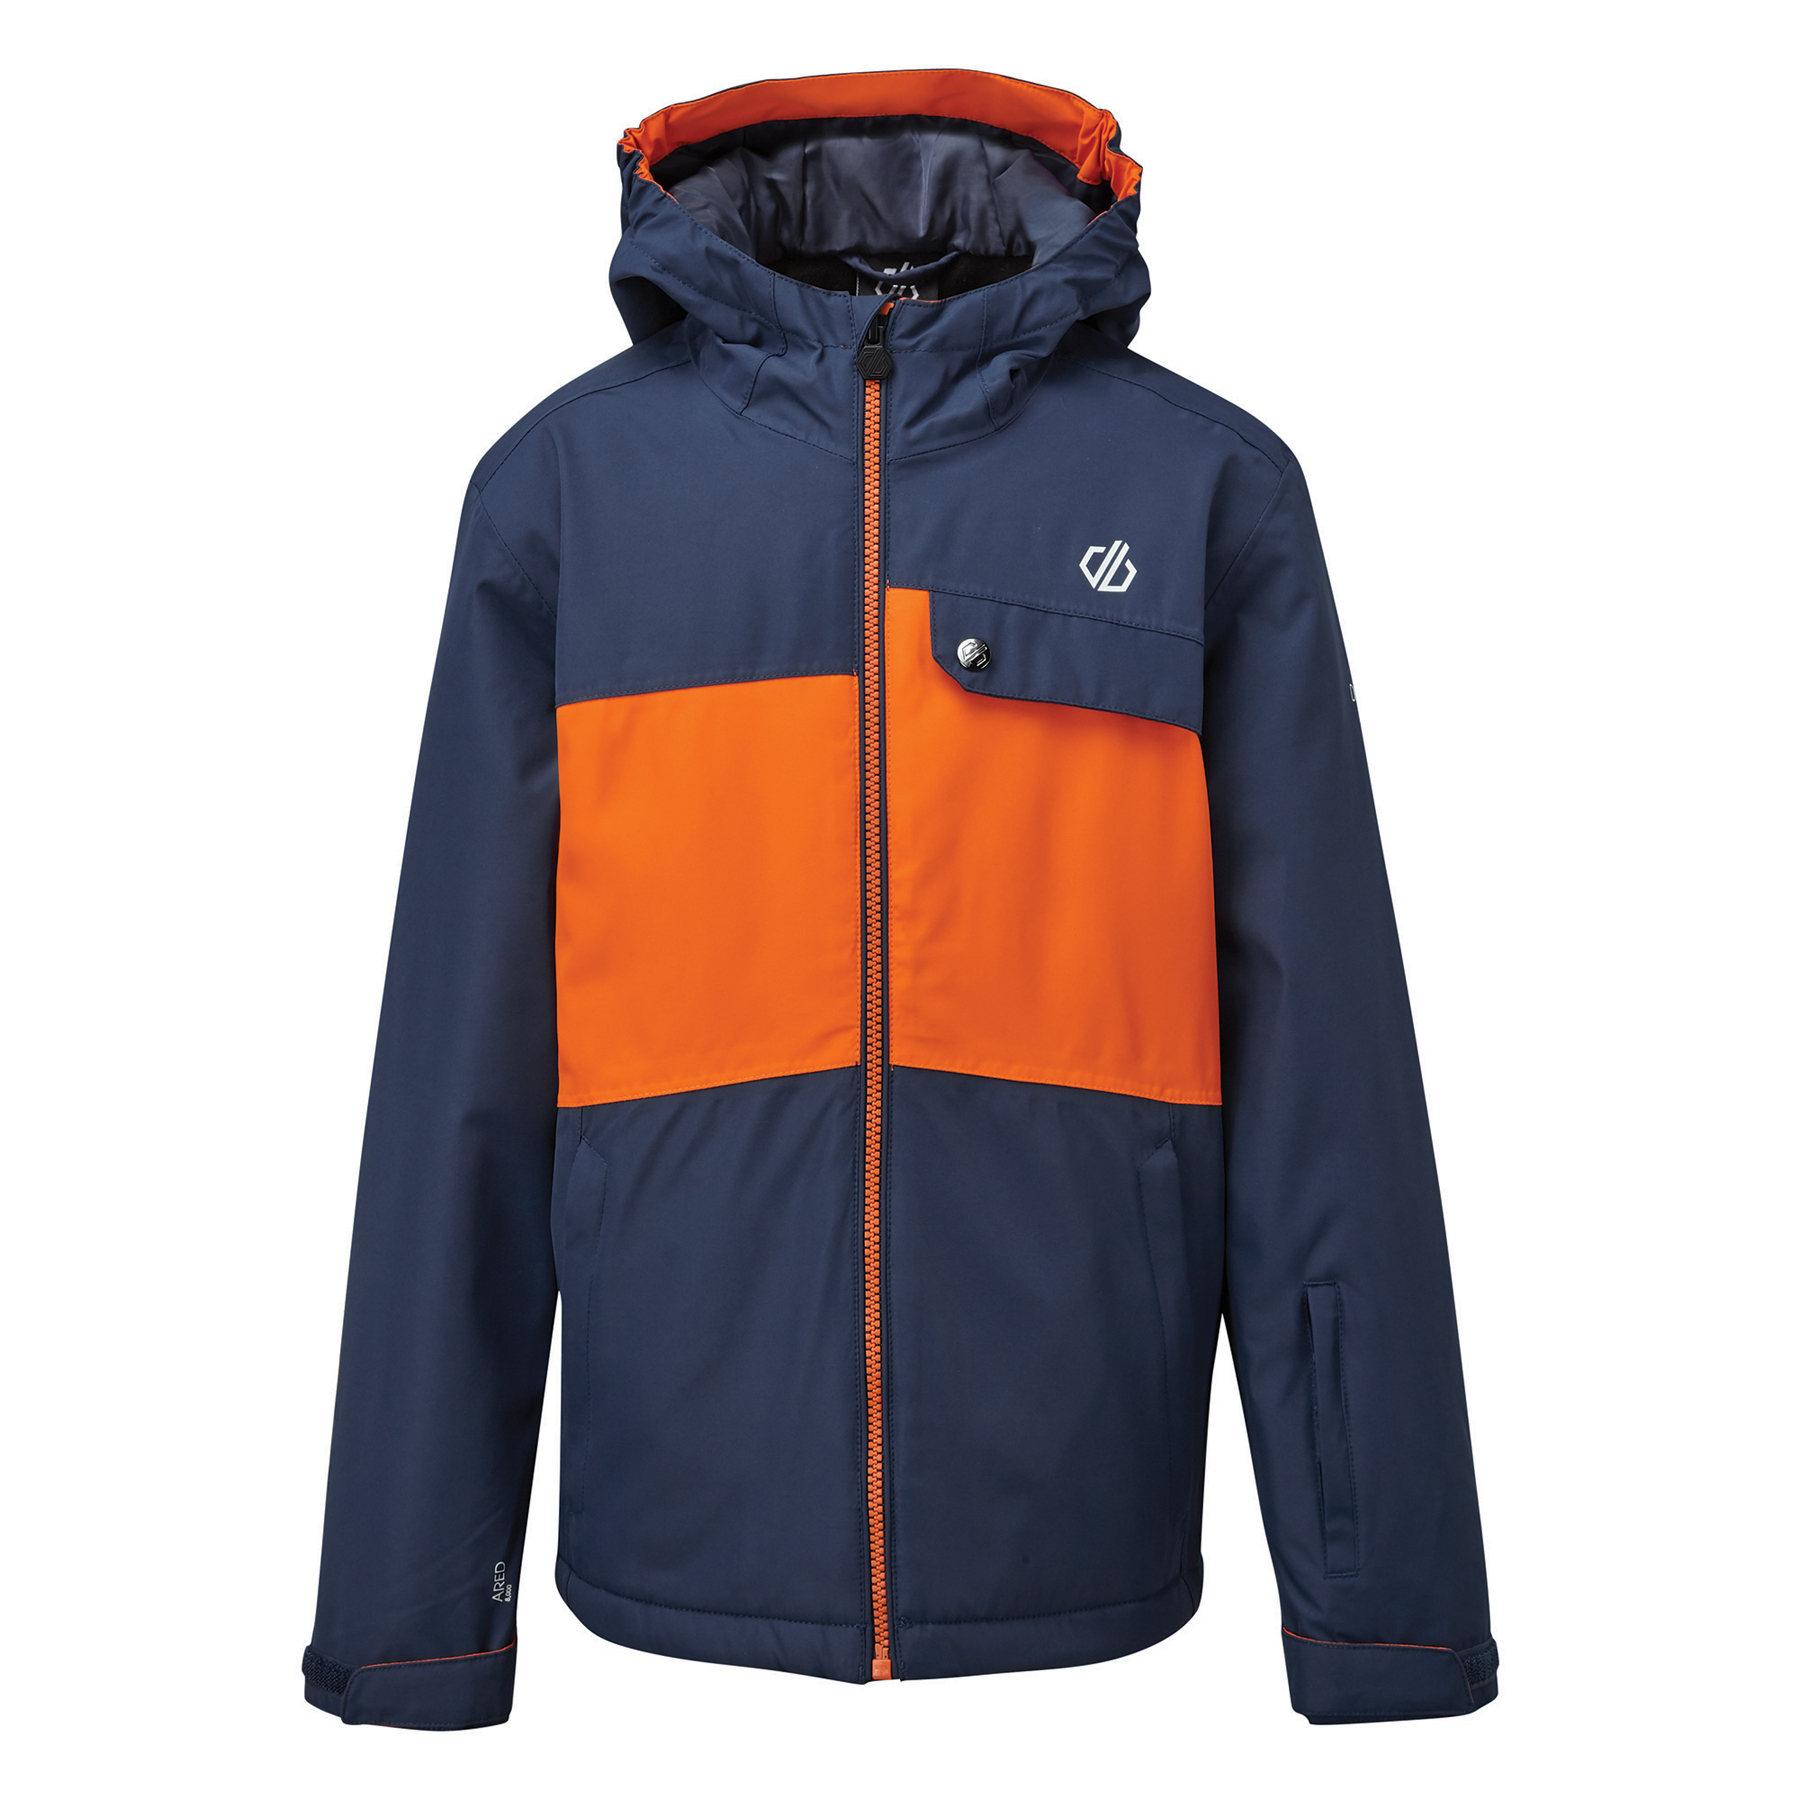 Dare 2b Enigmatic Jacket Kids - 40I Dark Denim/Blaze Orange